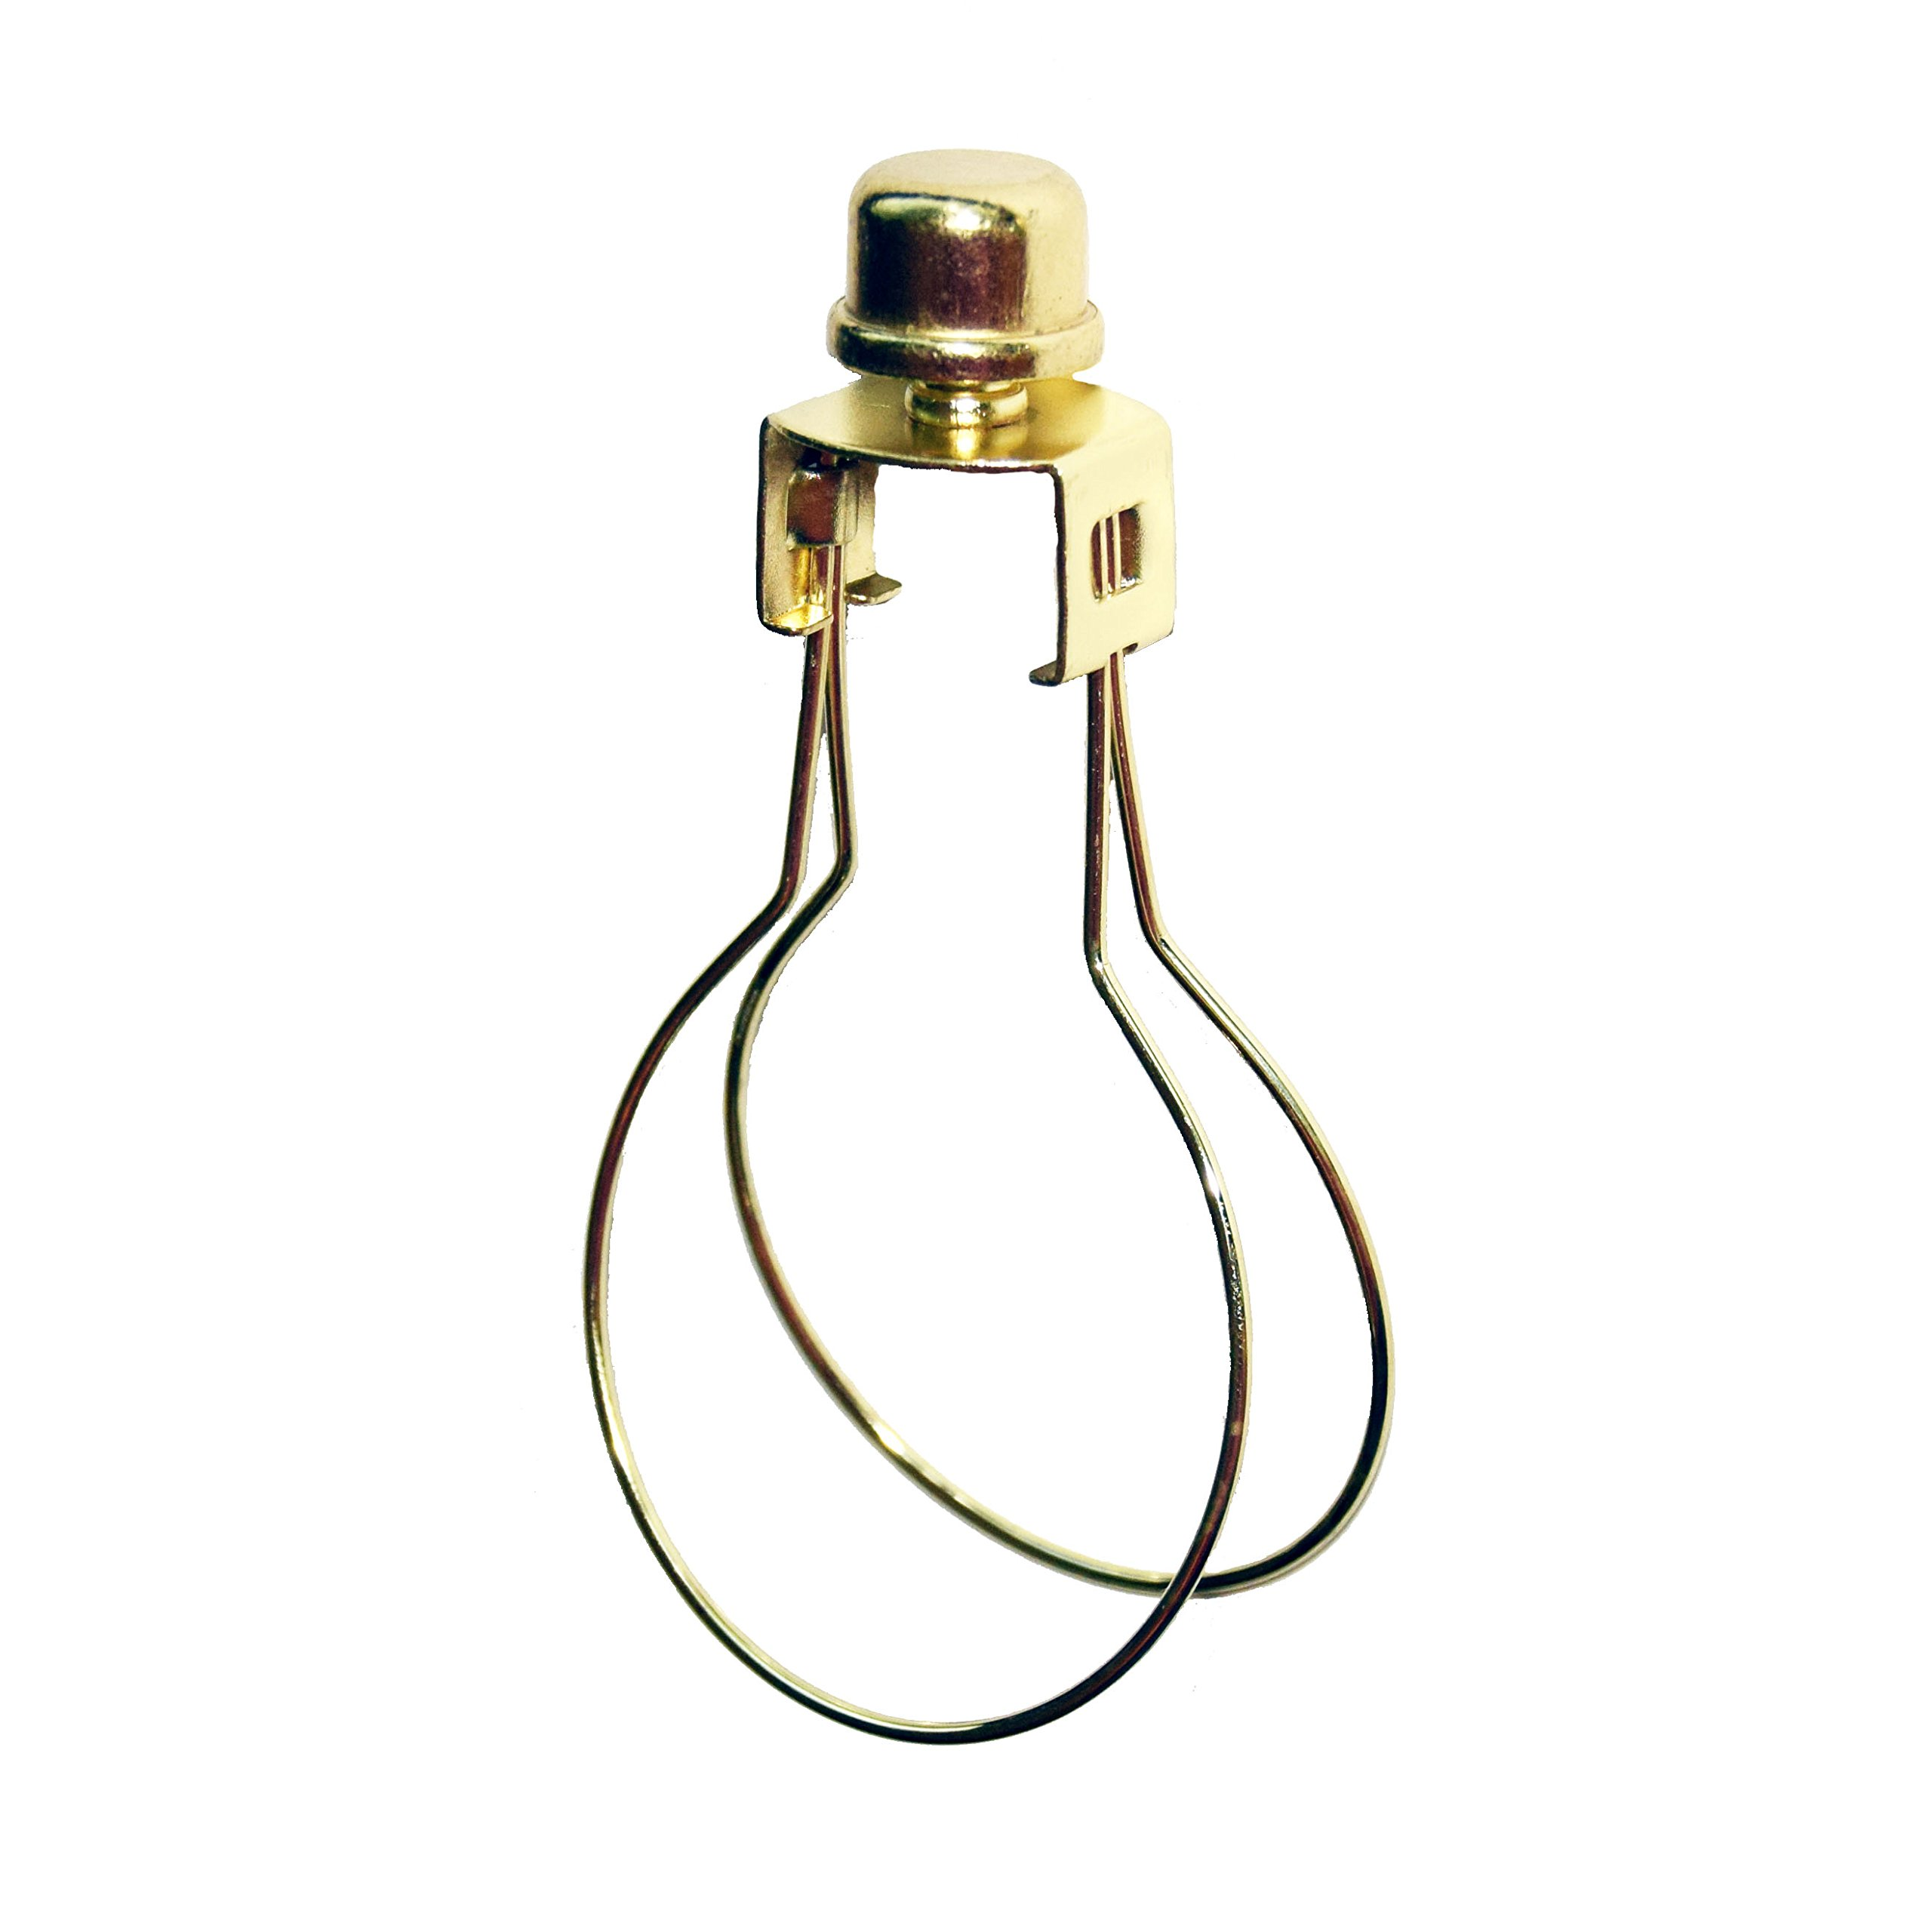 Cheap bulb clip lamp shade find bulb clip lamp shade deals on line antique light bulb co clip on light bulb lamp shade adapter with shade attaching aloadofball Gallery